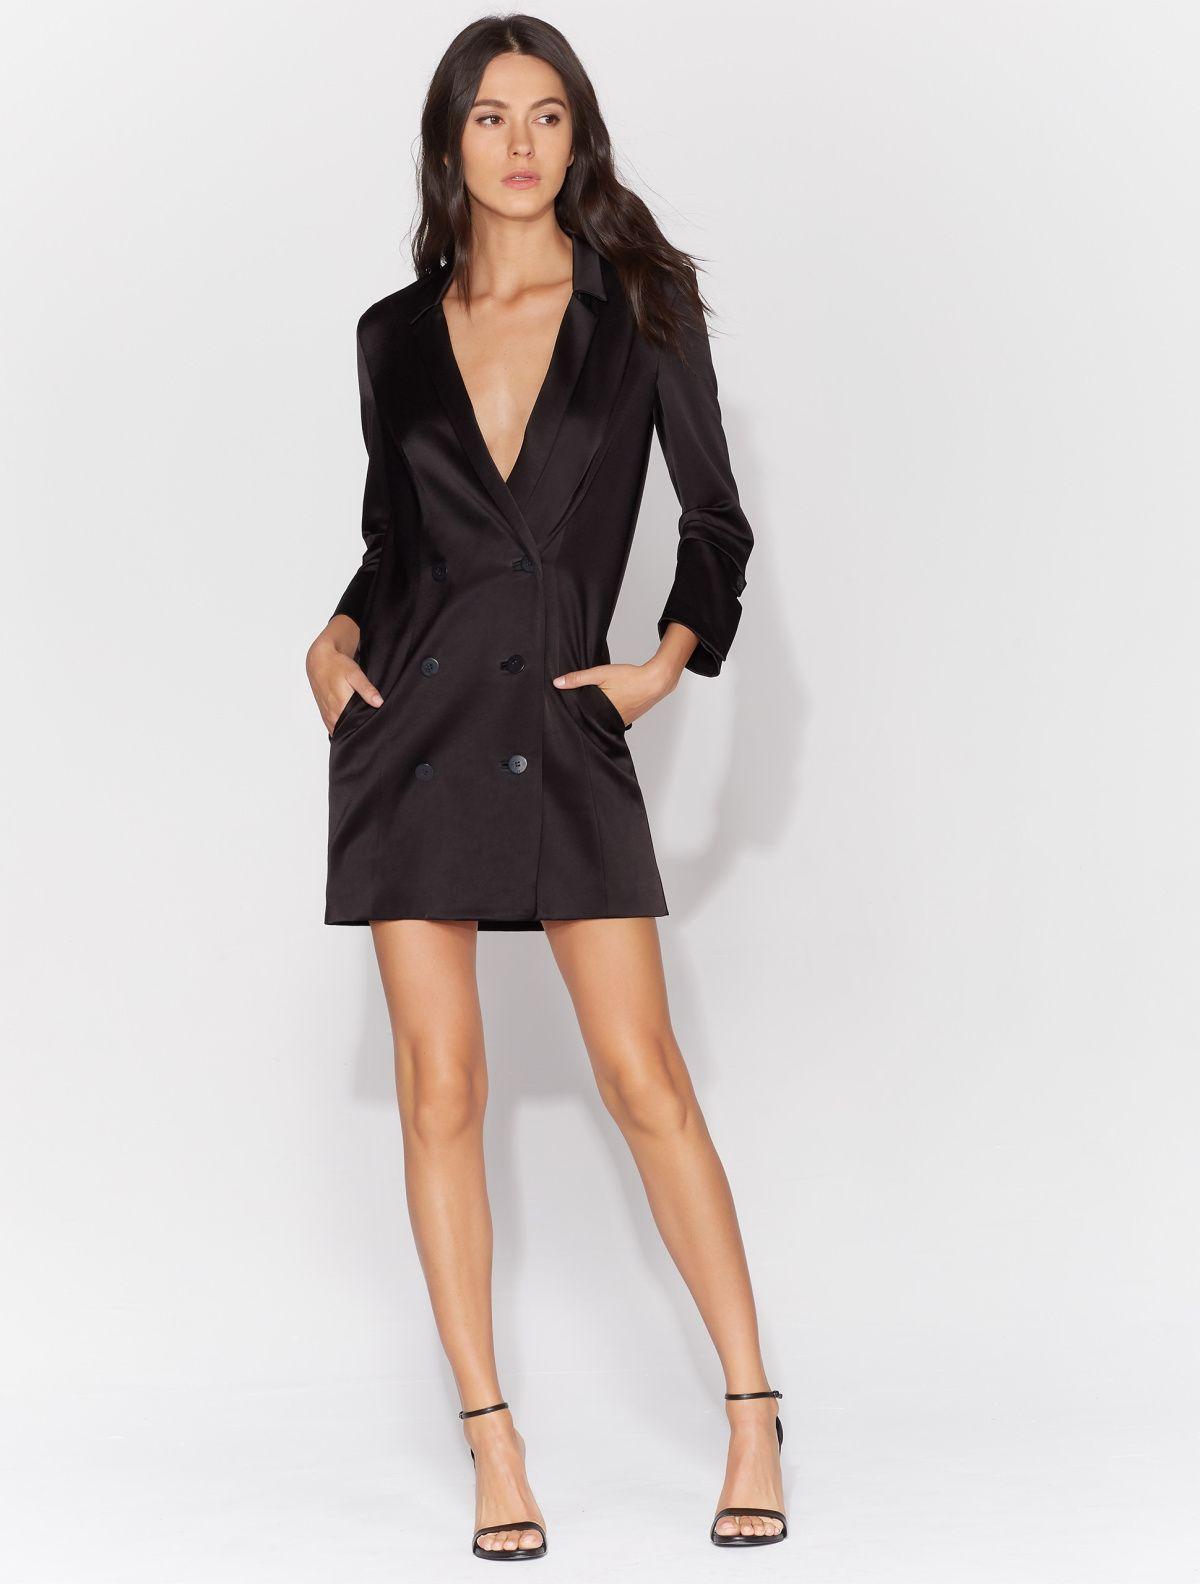 465f06ecb57a Halston Double Breasted Satin Tuxedo Dress | Halston Heritage: Fall ...